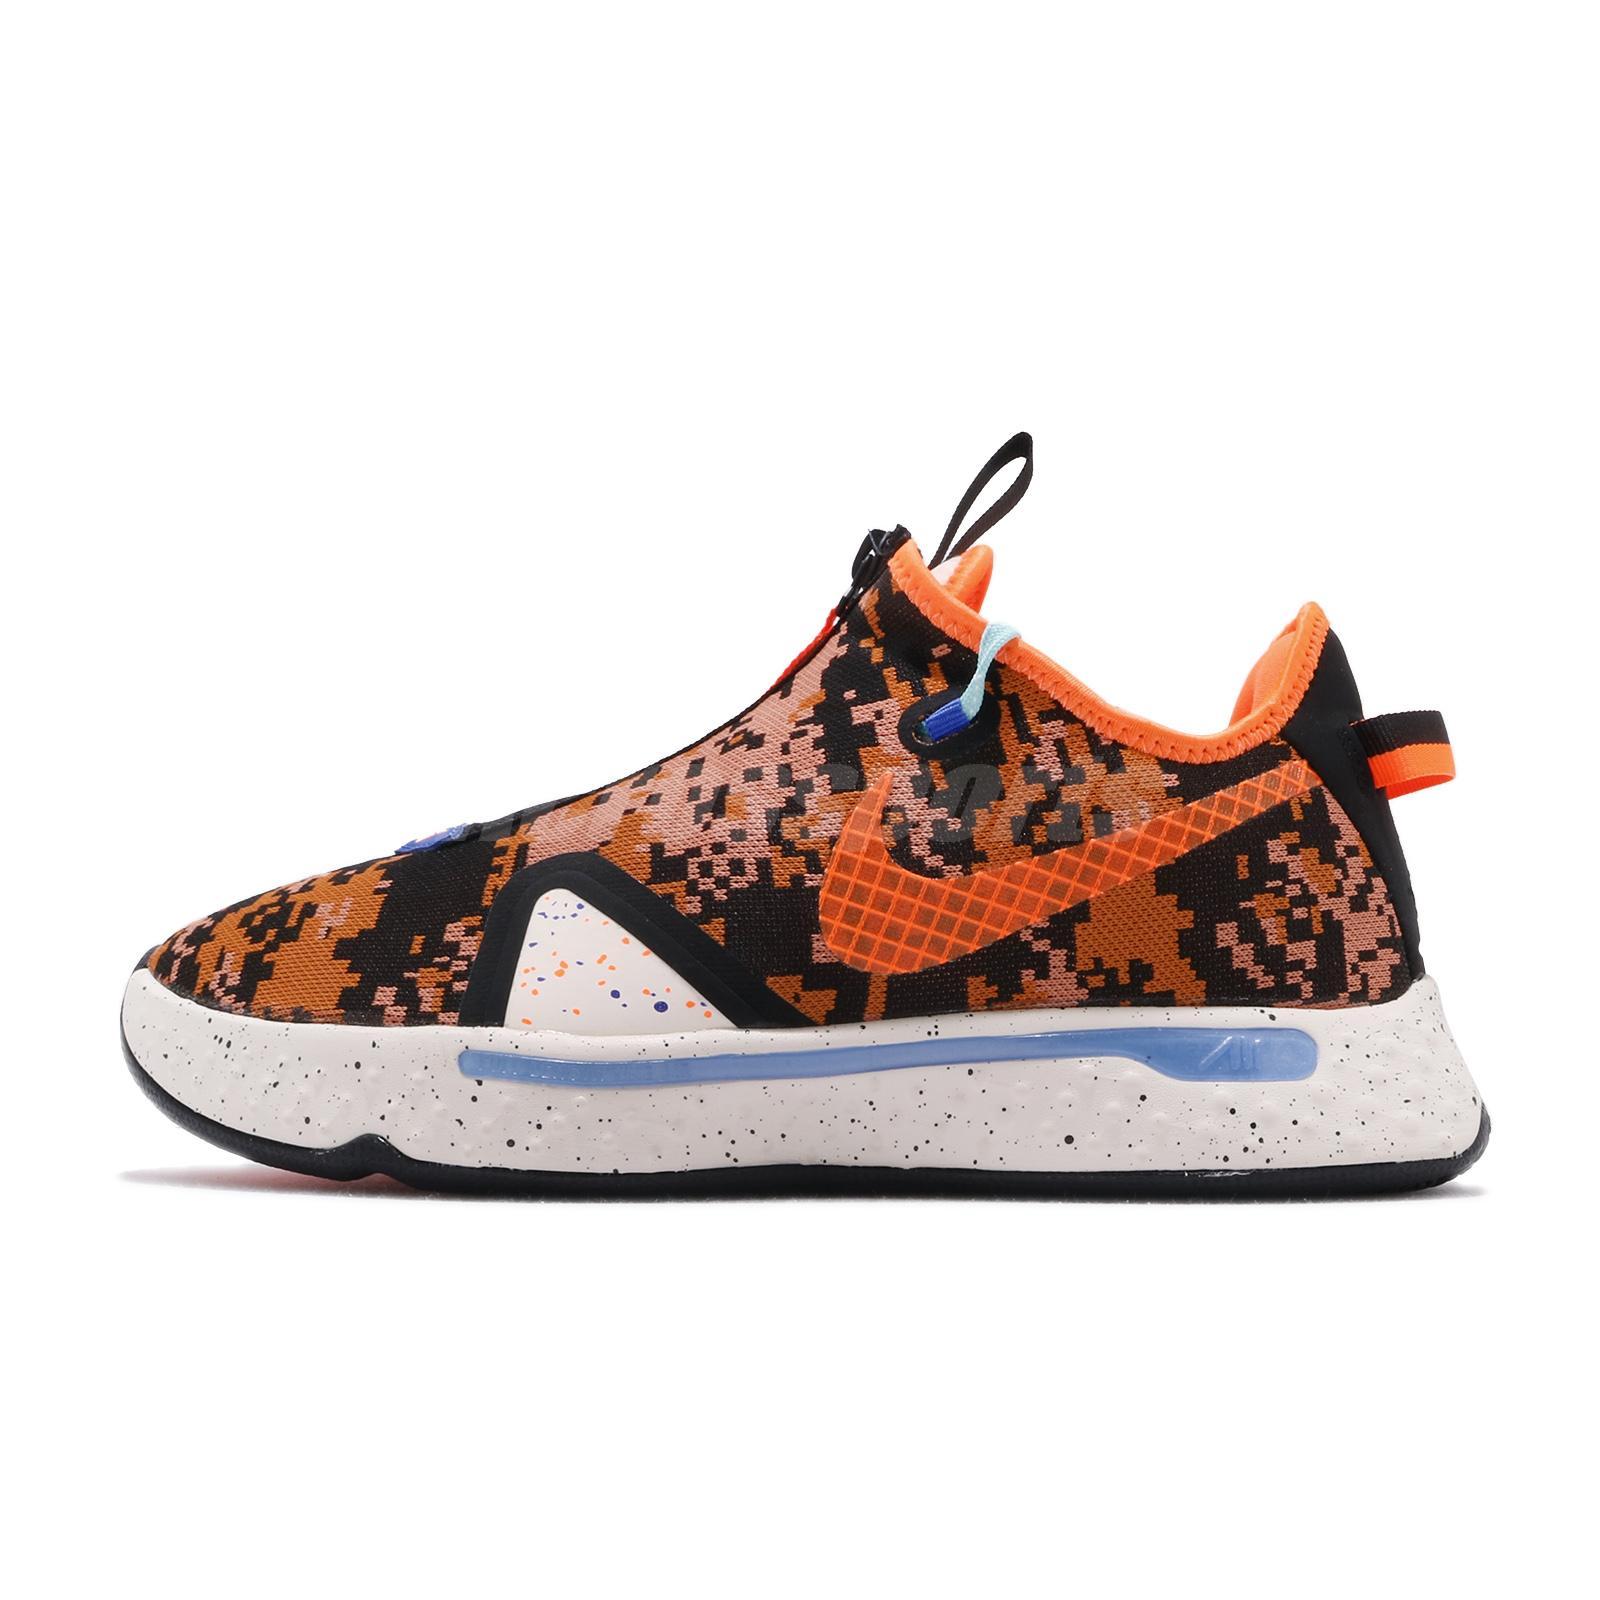 Nike PG 4 EP IV Paul George Orange